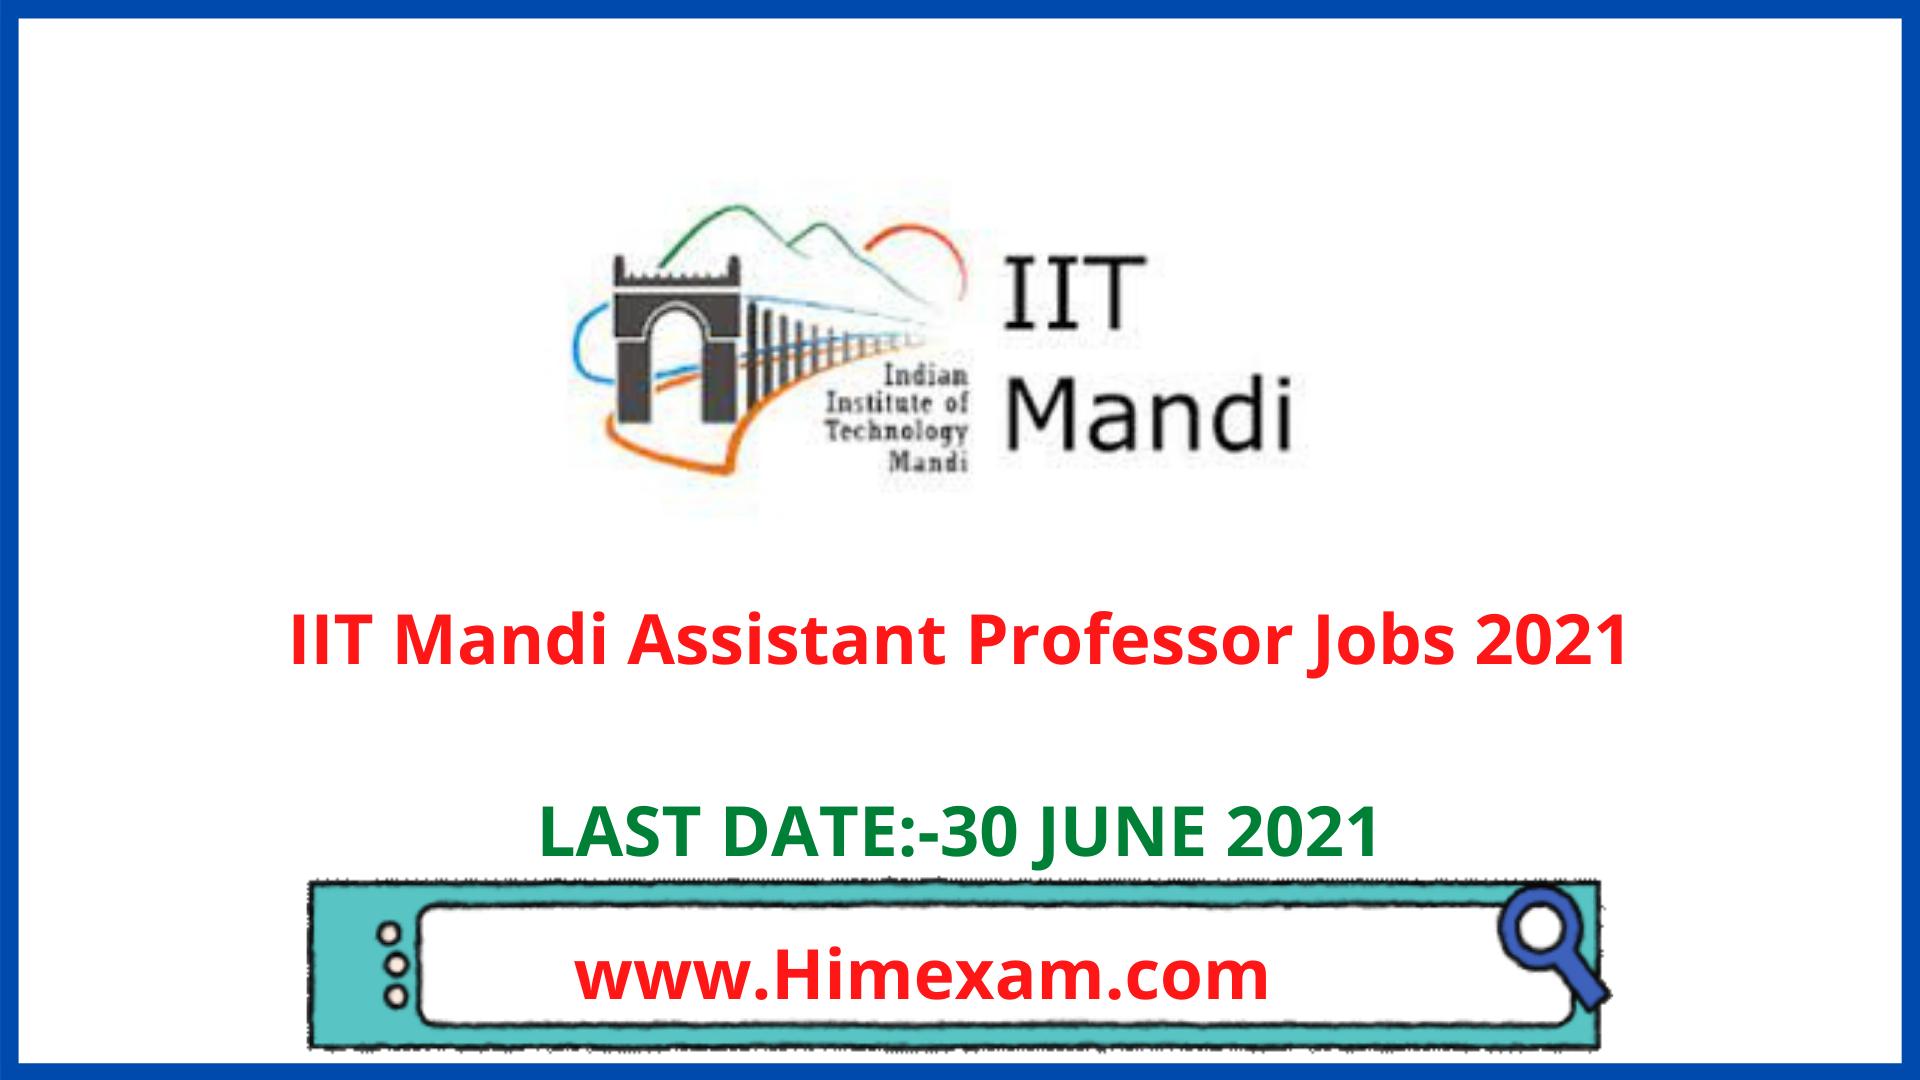 IIT Mandi Assistant Professor Jobs 2021